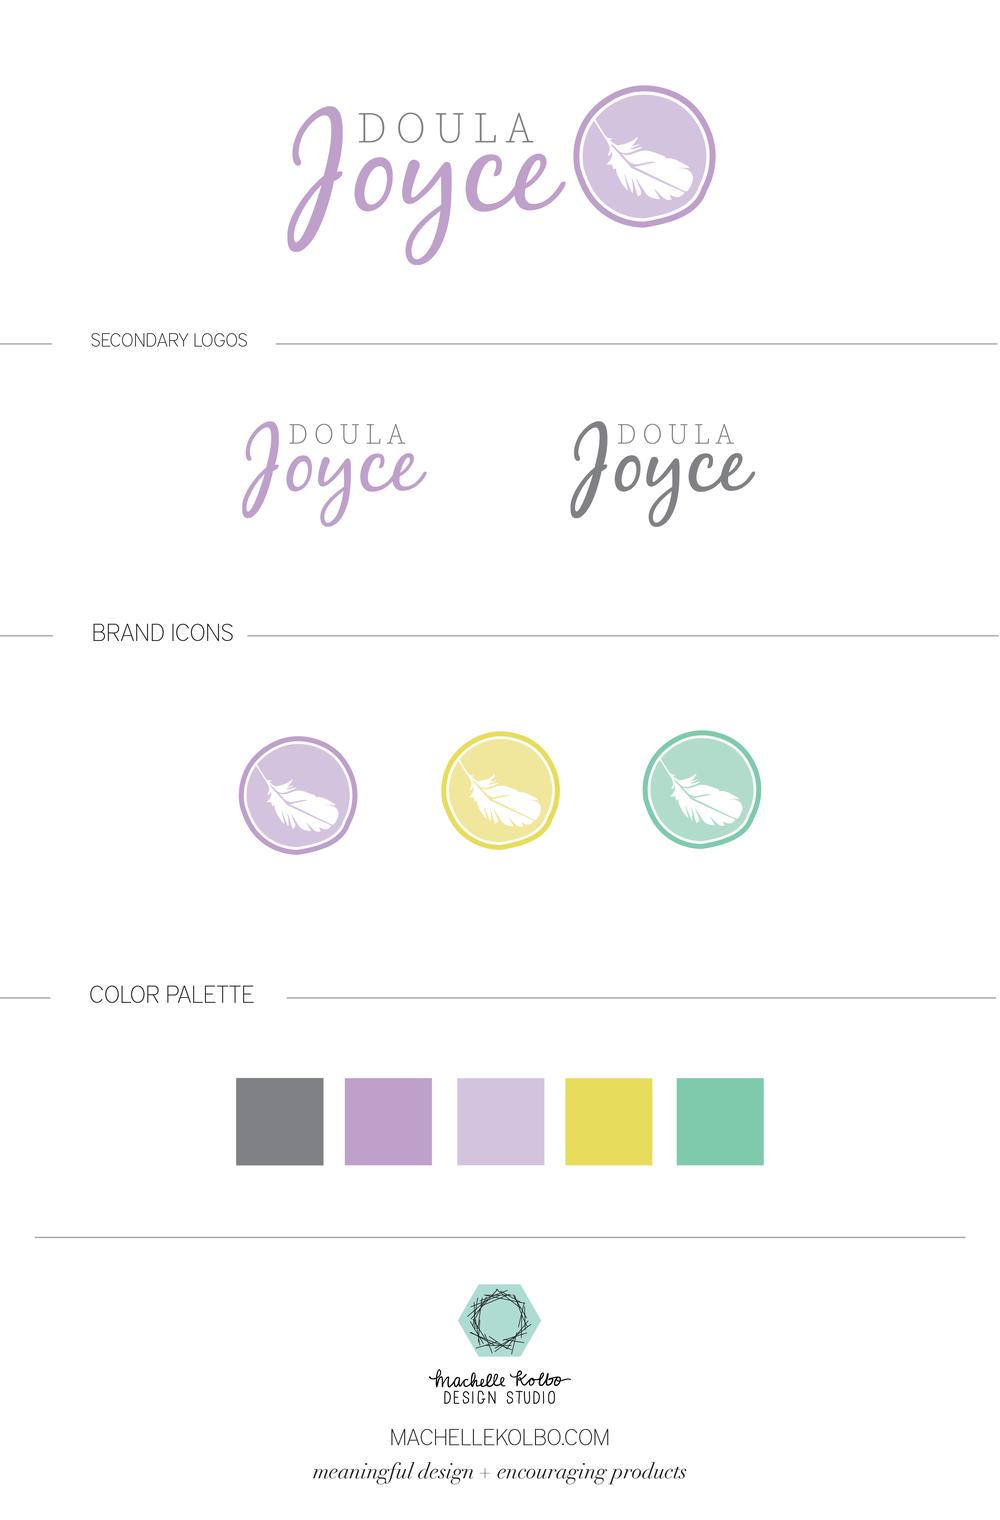 Doula Joyce Brand Identity Style Sheet